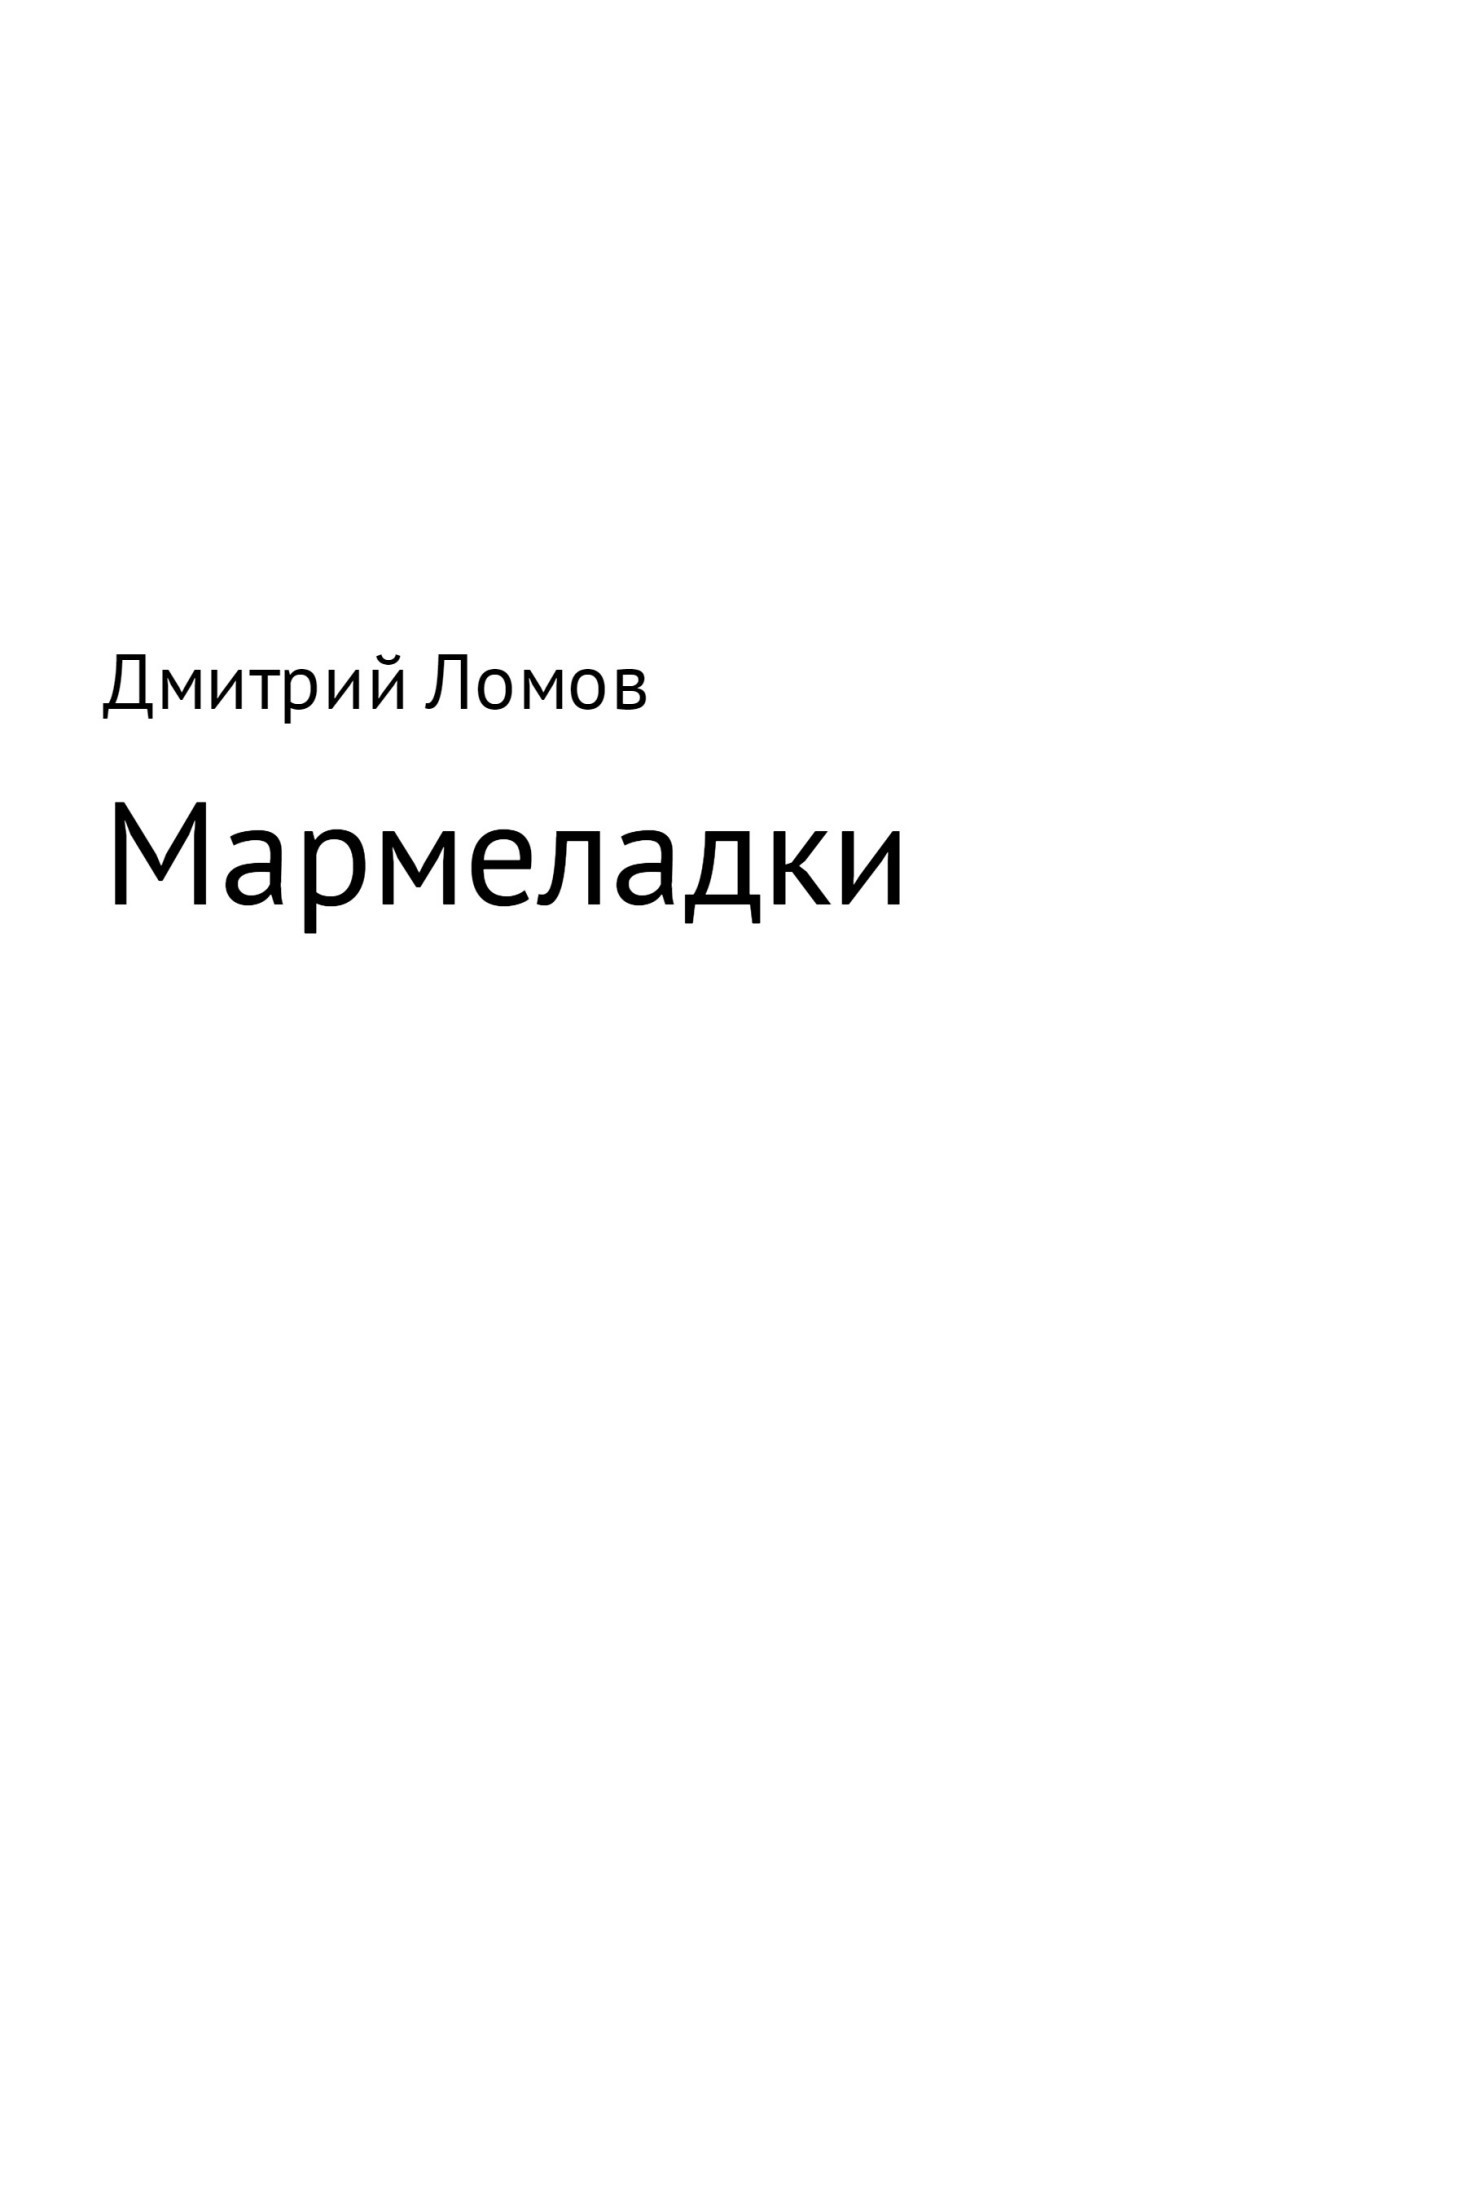 Дмитрий Ломов. Мармеладки